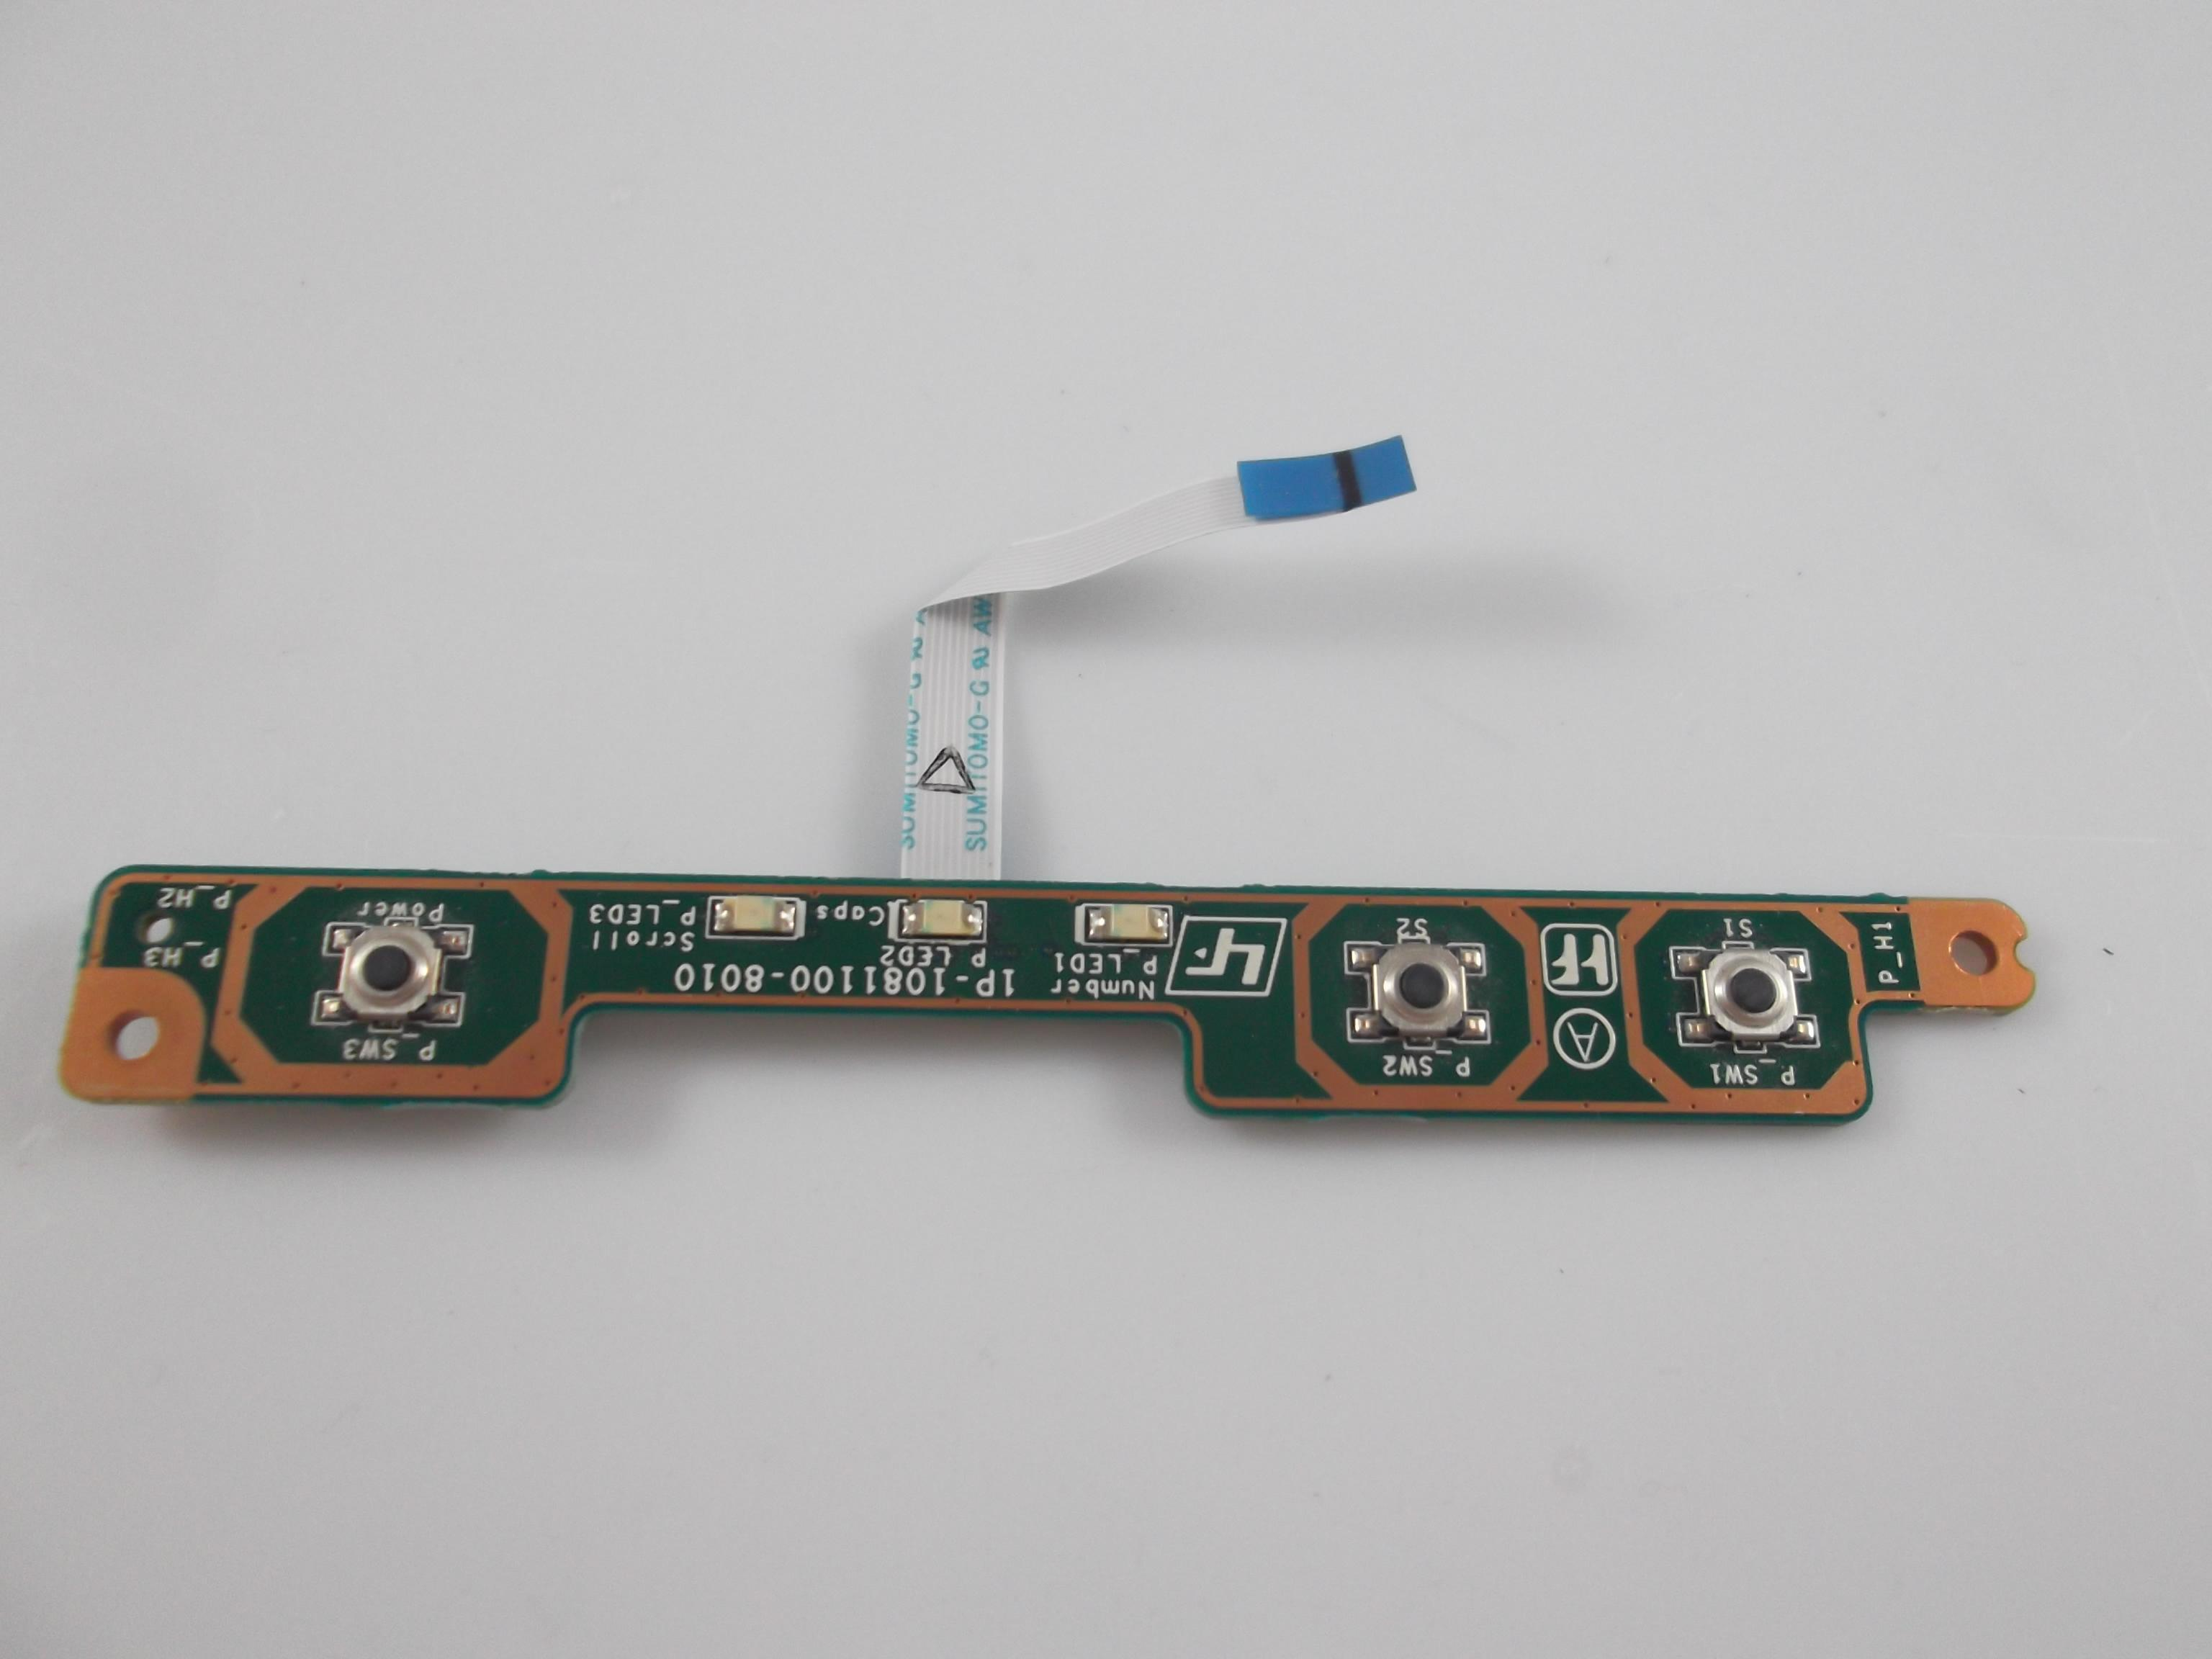 Sony vaio pcg-7131m